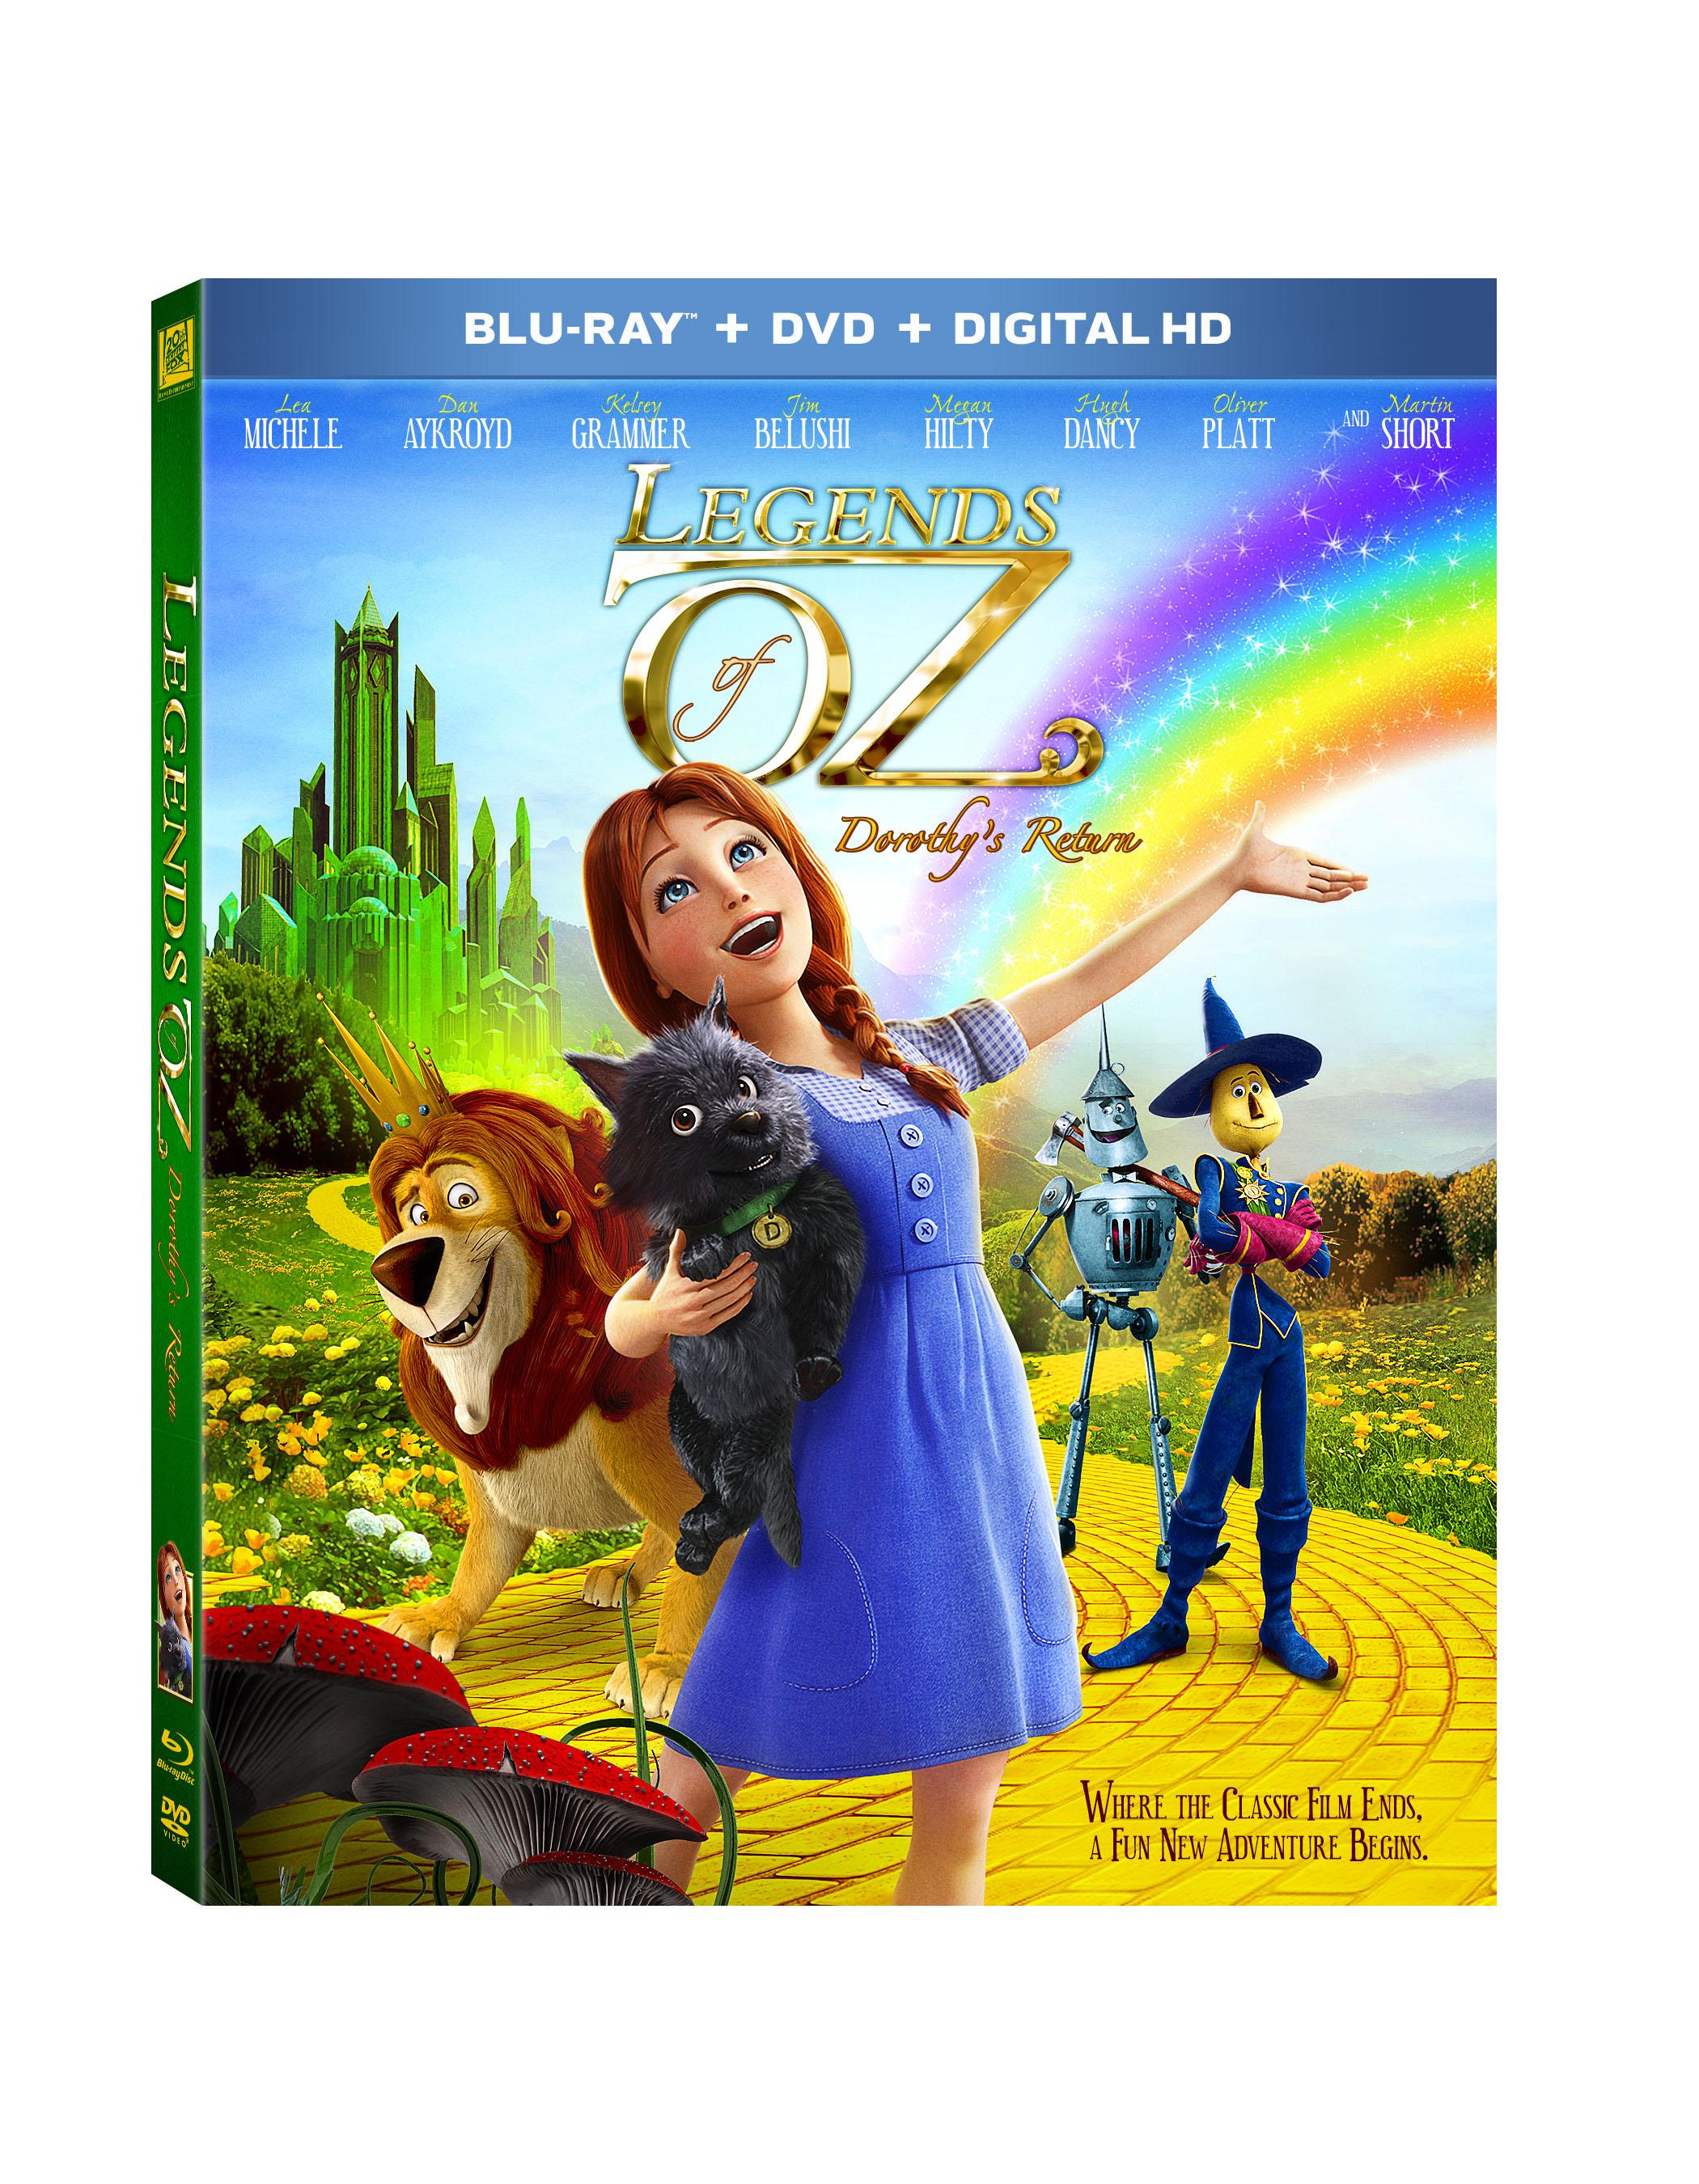 Win Legends of Oz Blu-Ray! #OzInsiders ~ Ends 9/8/14